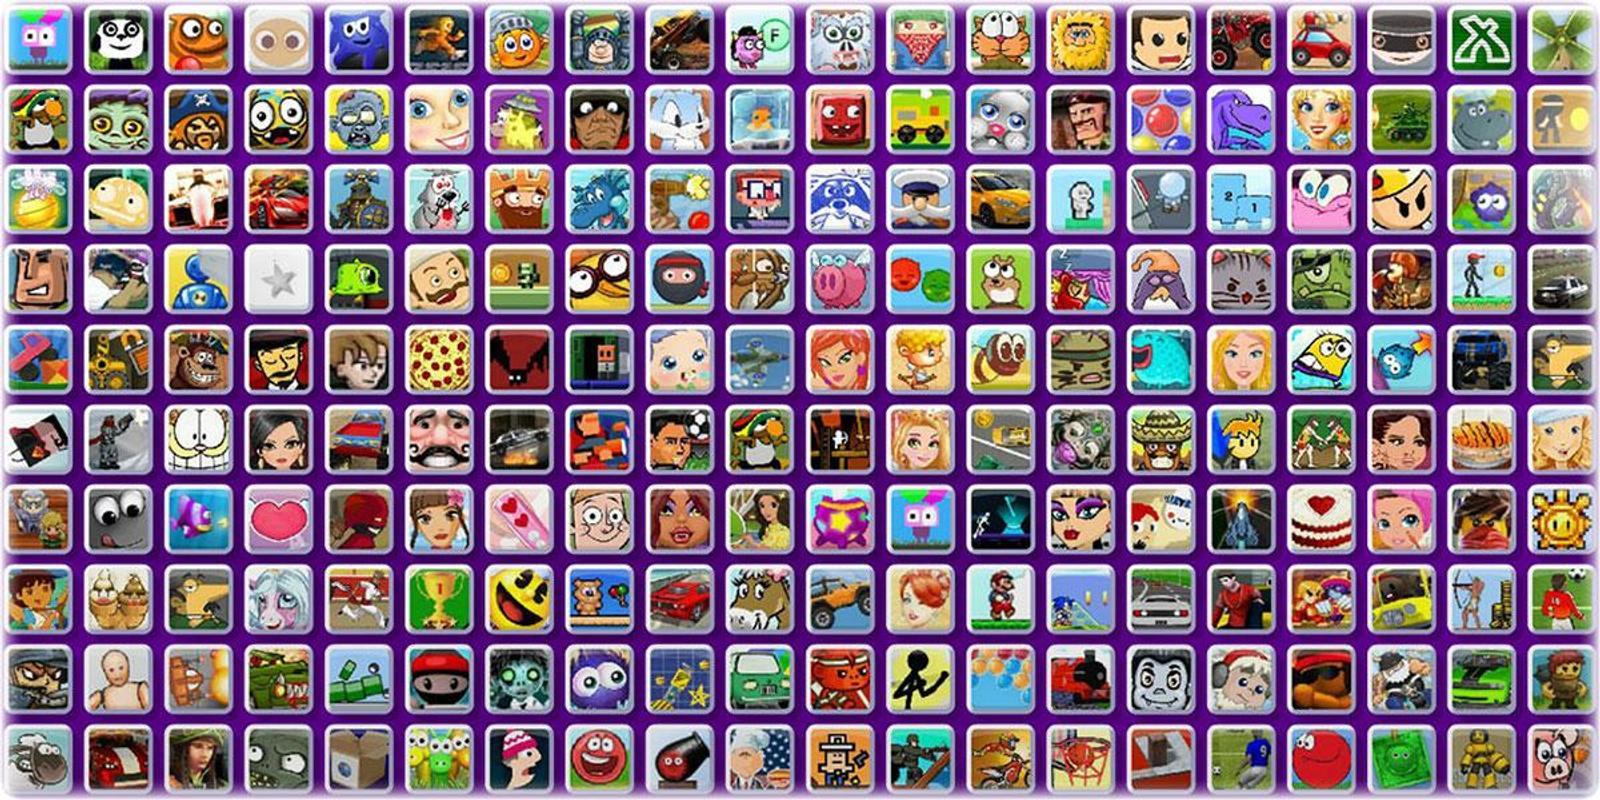 Juegos Gratis For Android Apk Download